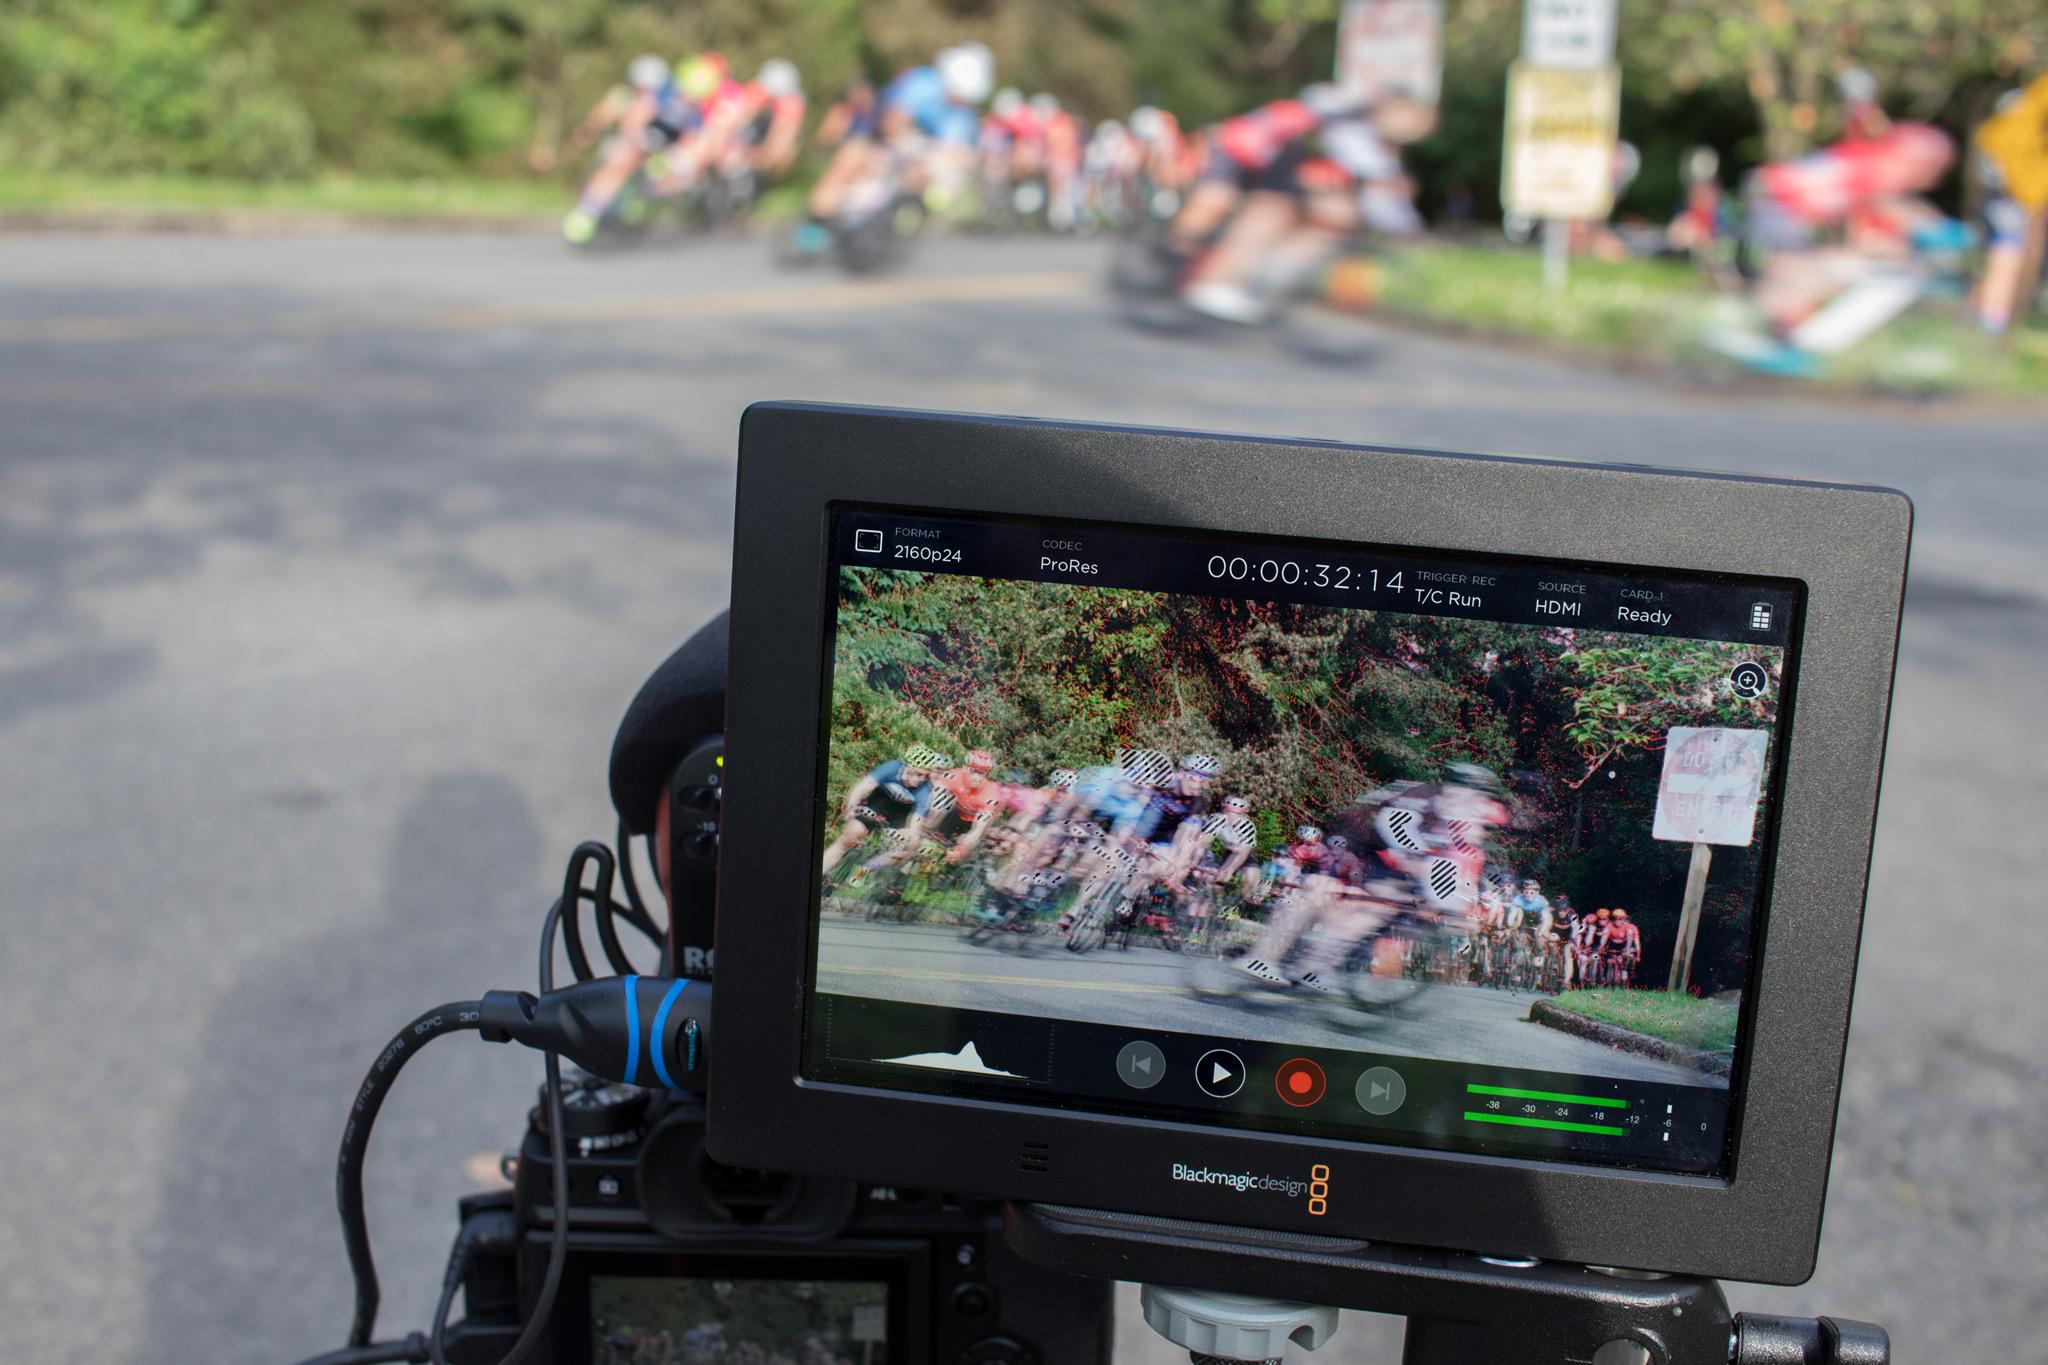 Blackmagic Video Assist 4k Review Digital Photography Review